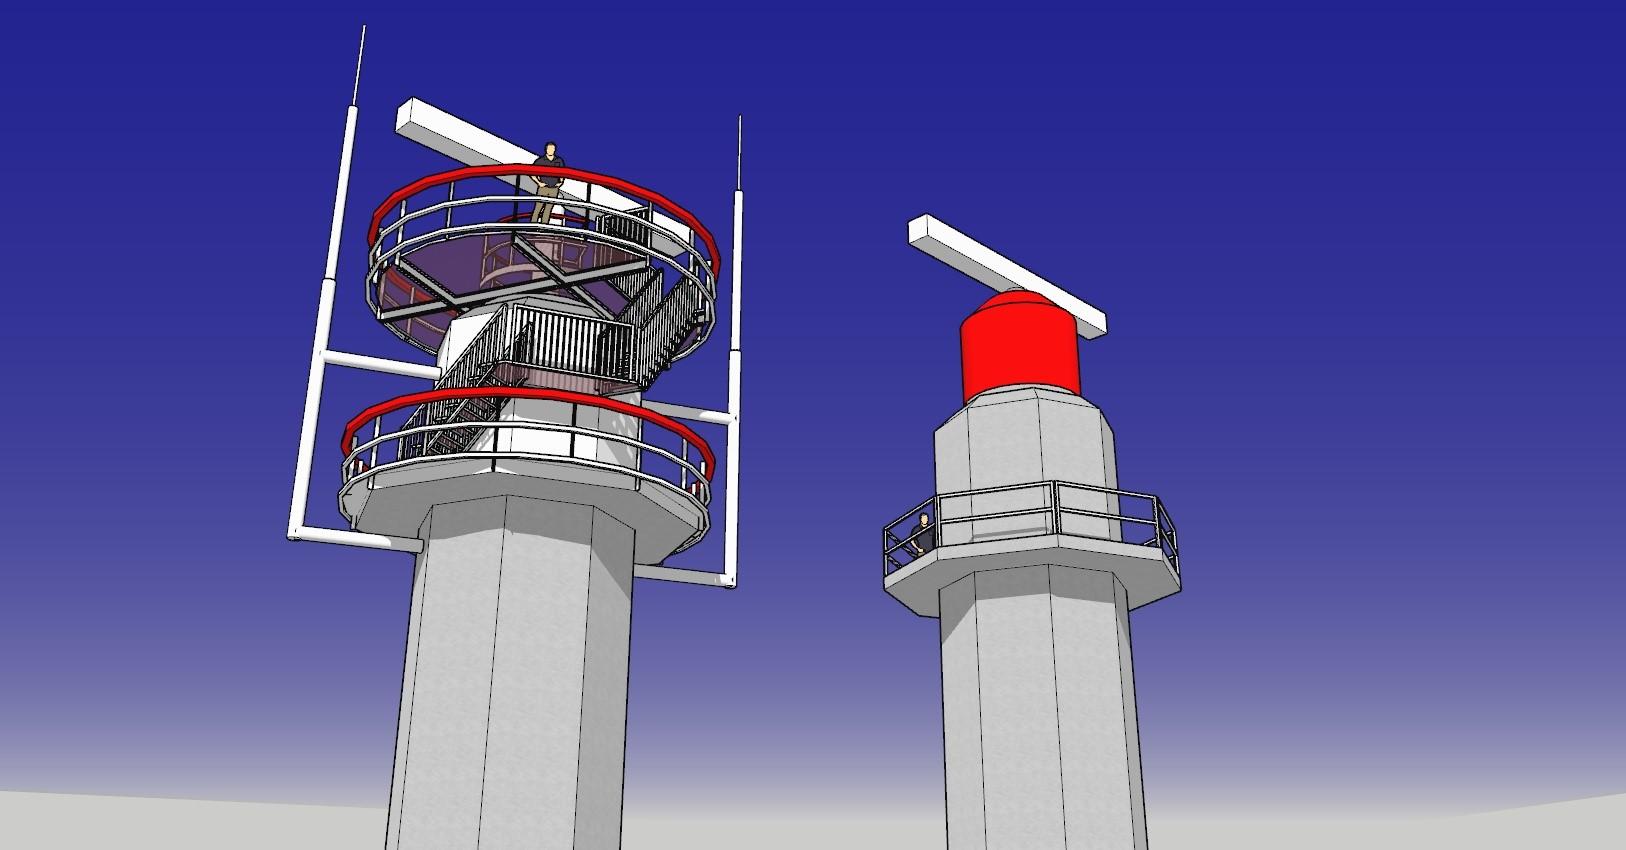 Vervanging koepels radartorens succesvol van start